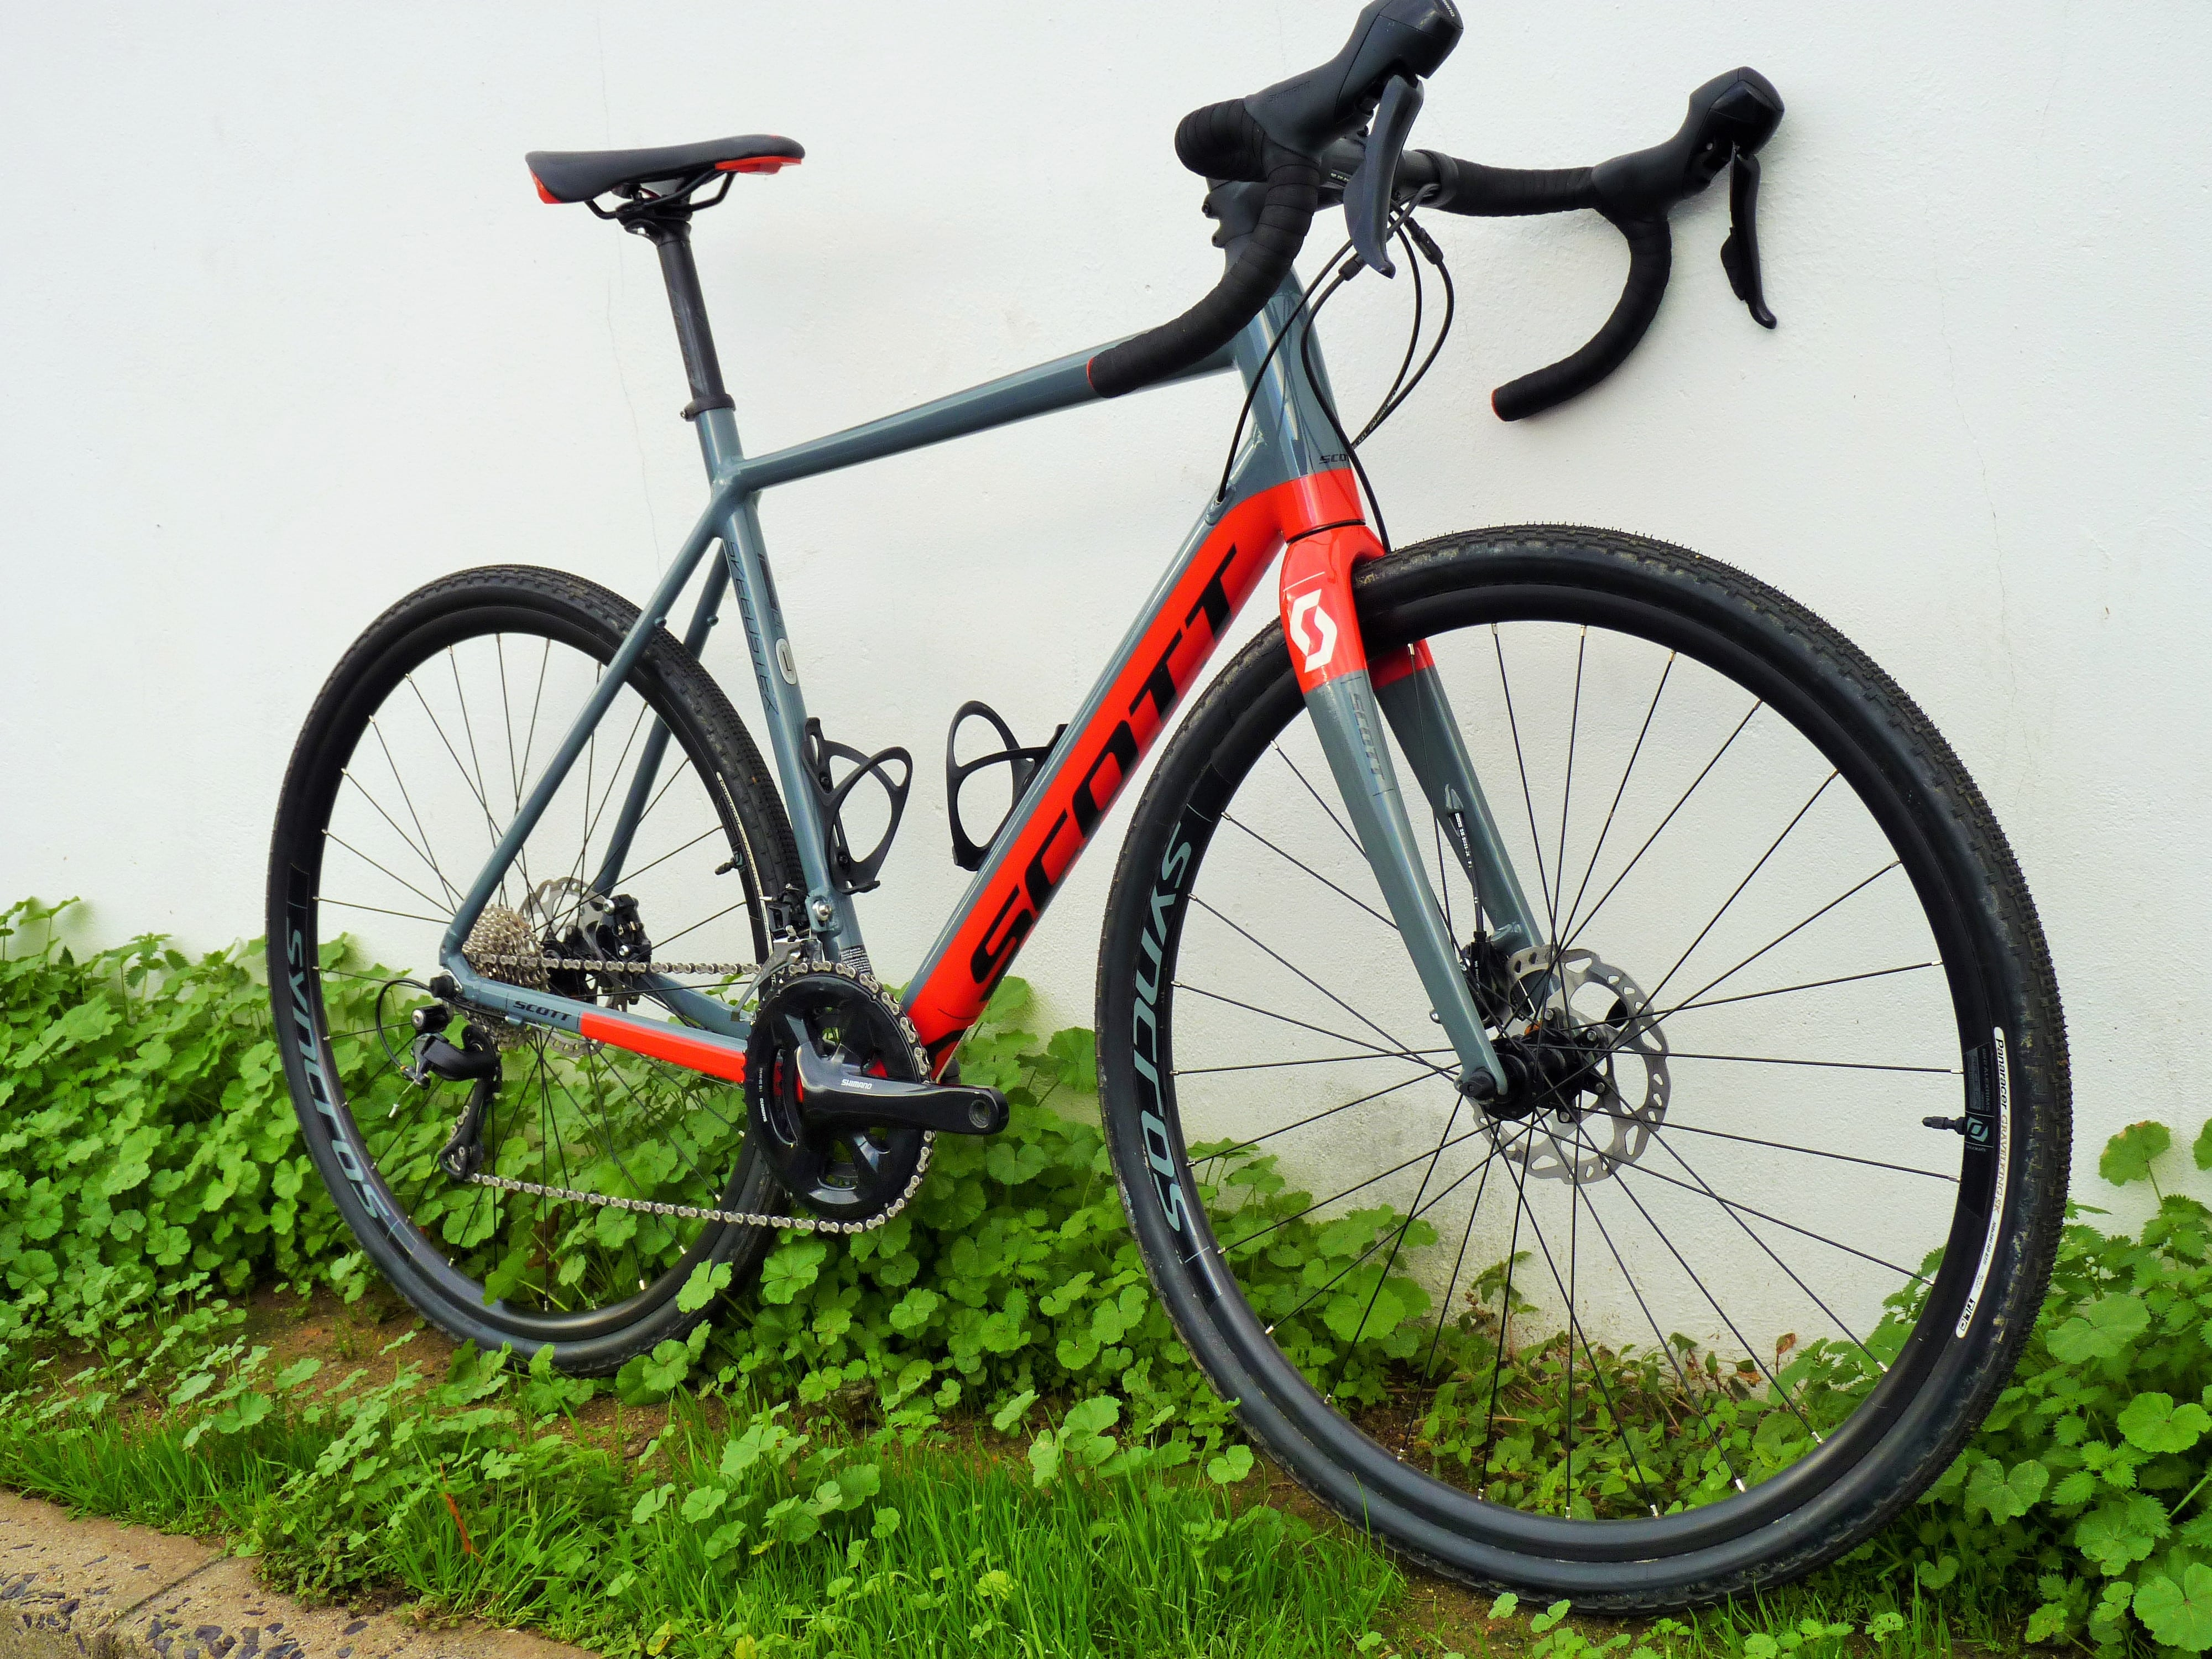 1a806d9e848 2018 SCOTT Speedster Gravel 10 Review – The Swiss Trailblazer ...